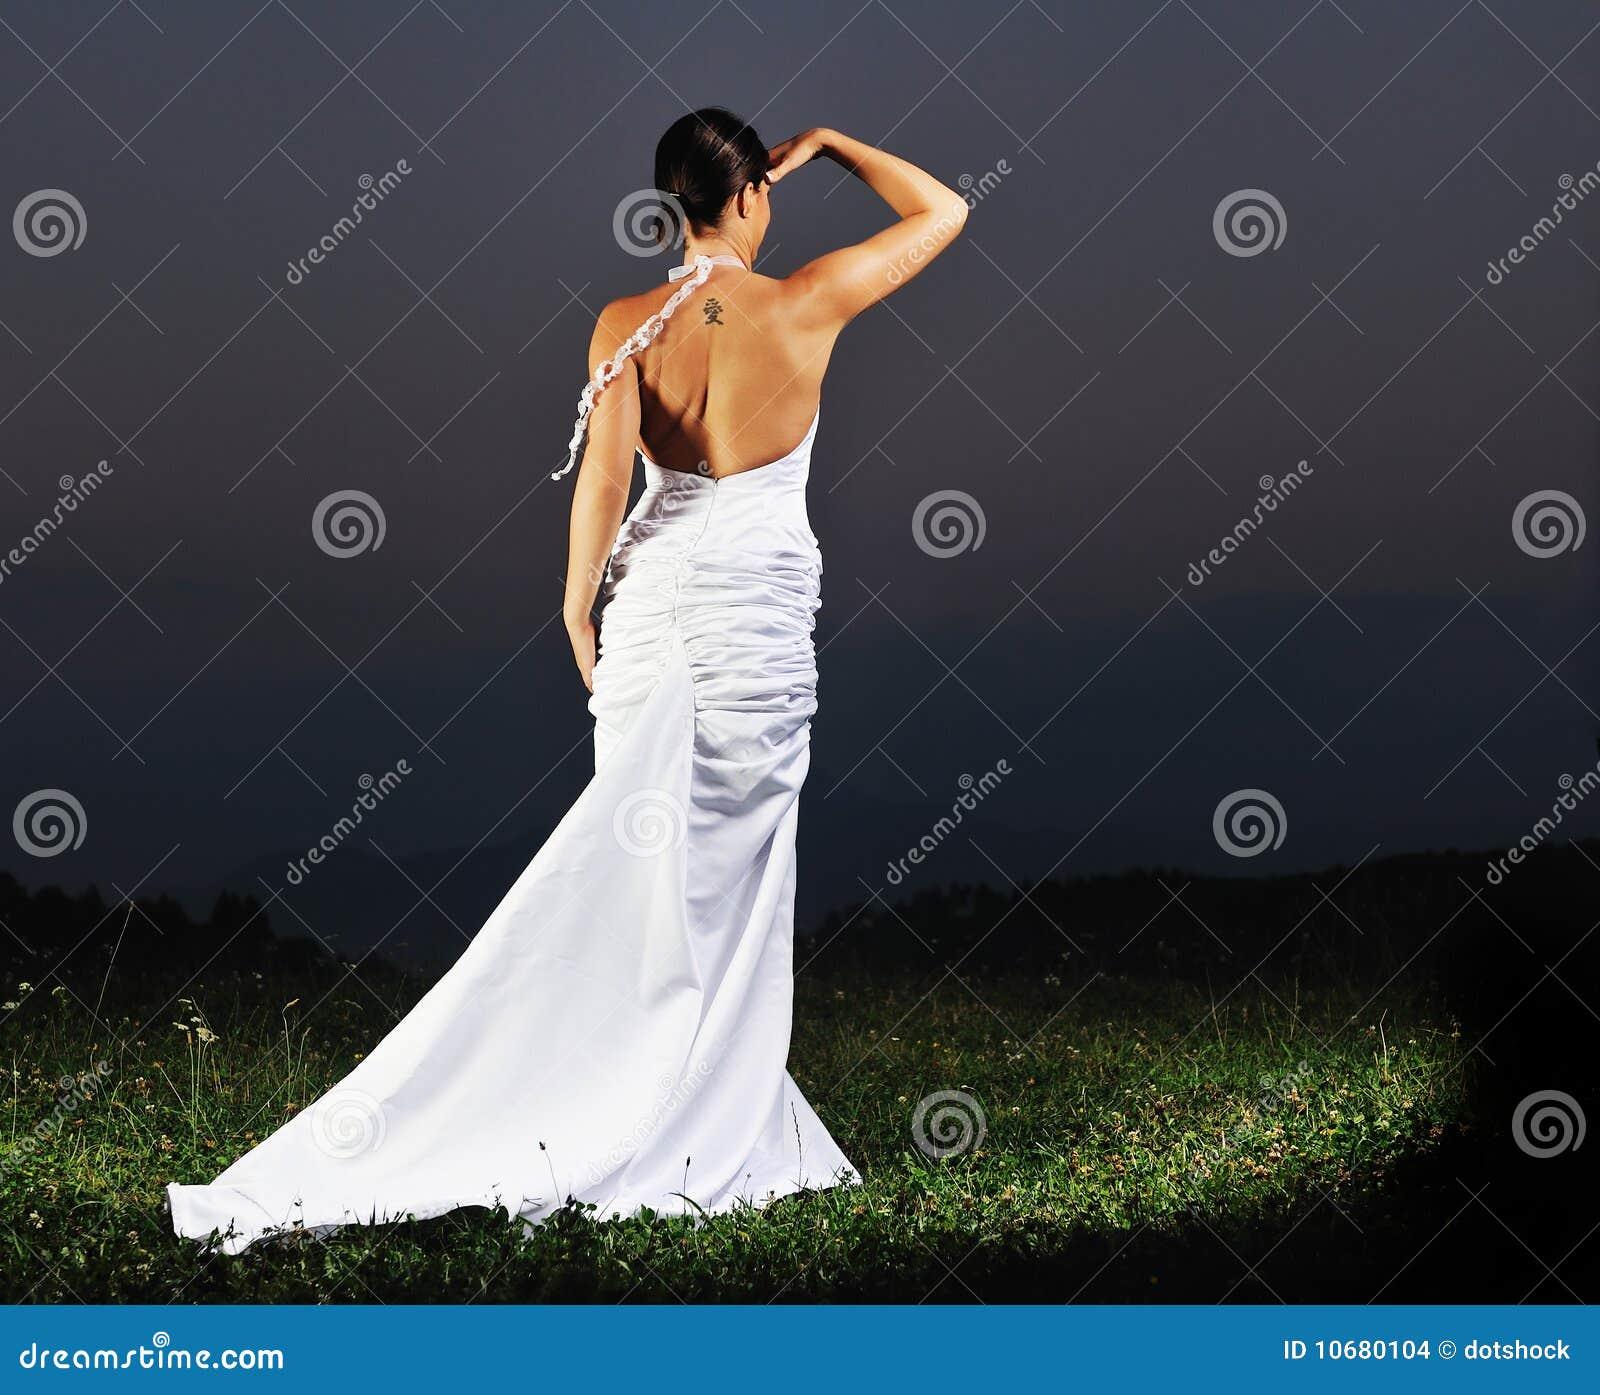 beautiful bride outdoor after wedding ceremony stock images image 10680104. Black Bedroom Furniture Sets. Home Design Ideas